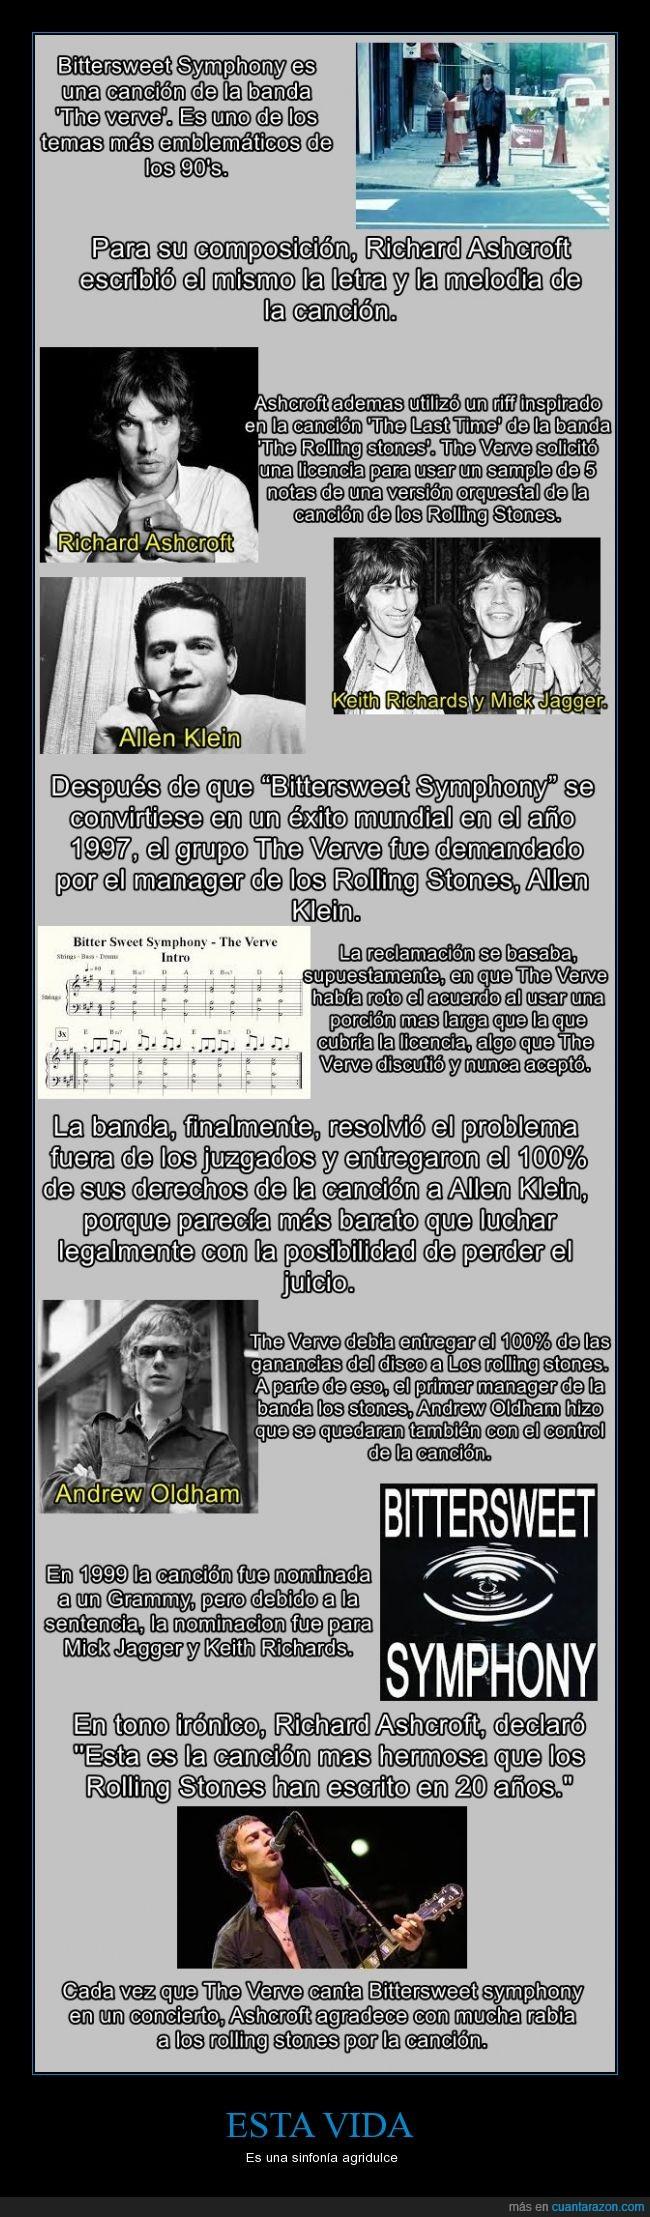 aprende algo dinero,bittersweet symphony,demanda,demandado,musica,negocio,Richard Ashcroft,riff,rolling stones,solo,the last time,the verve,violin